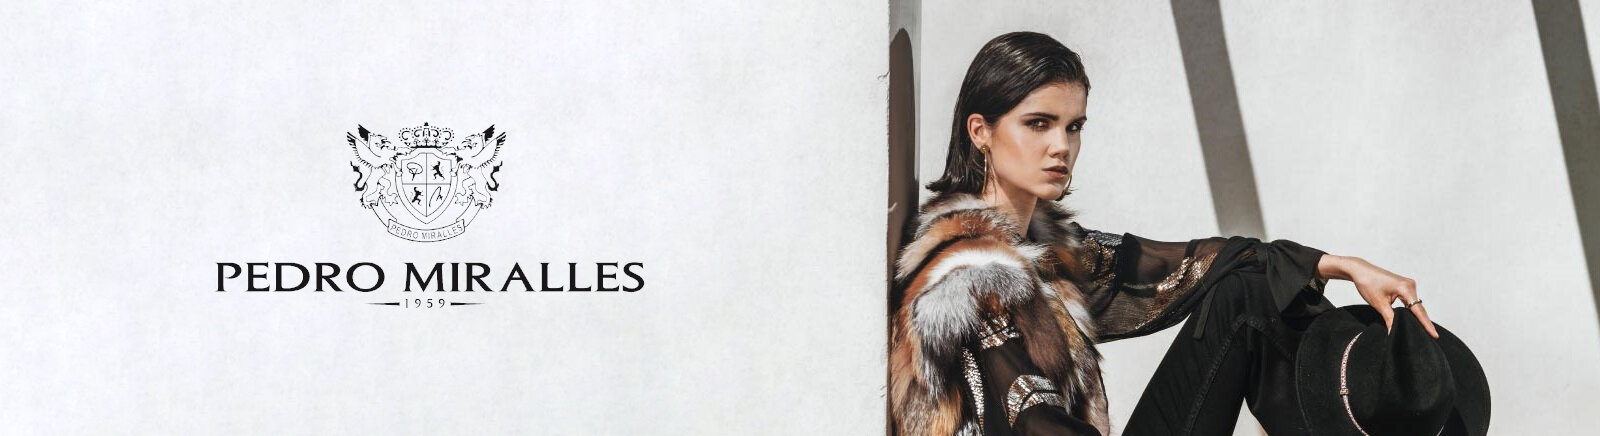 Pedro Miralles Damenschuhe online bestellen im Prange Schuhe Shop